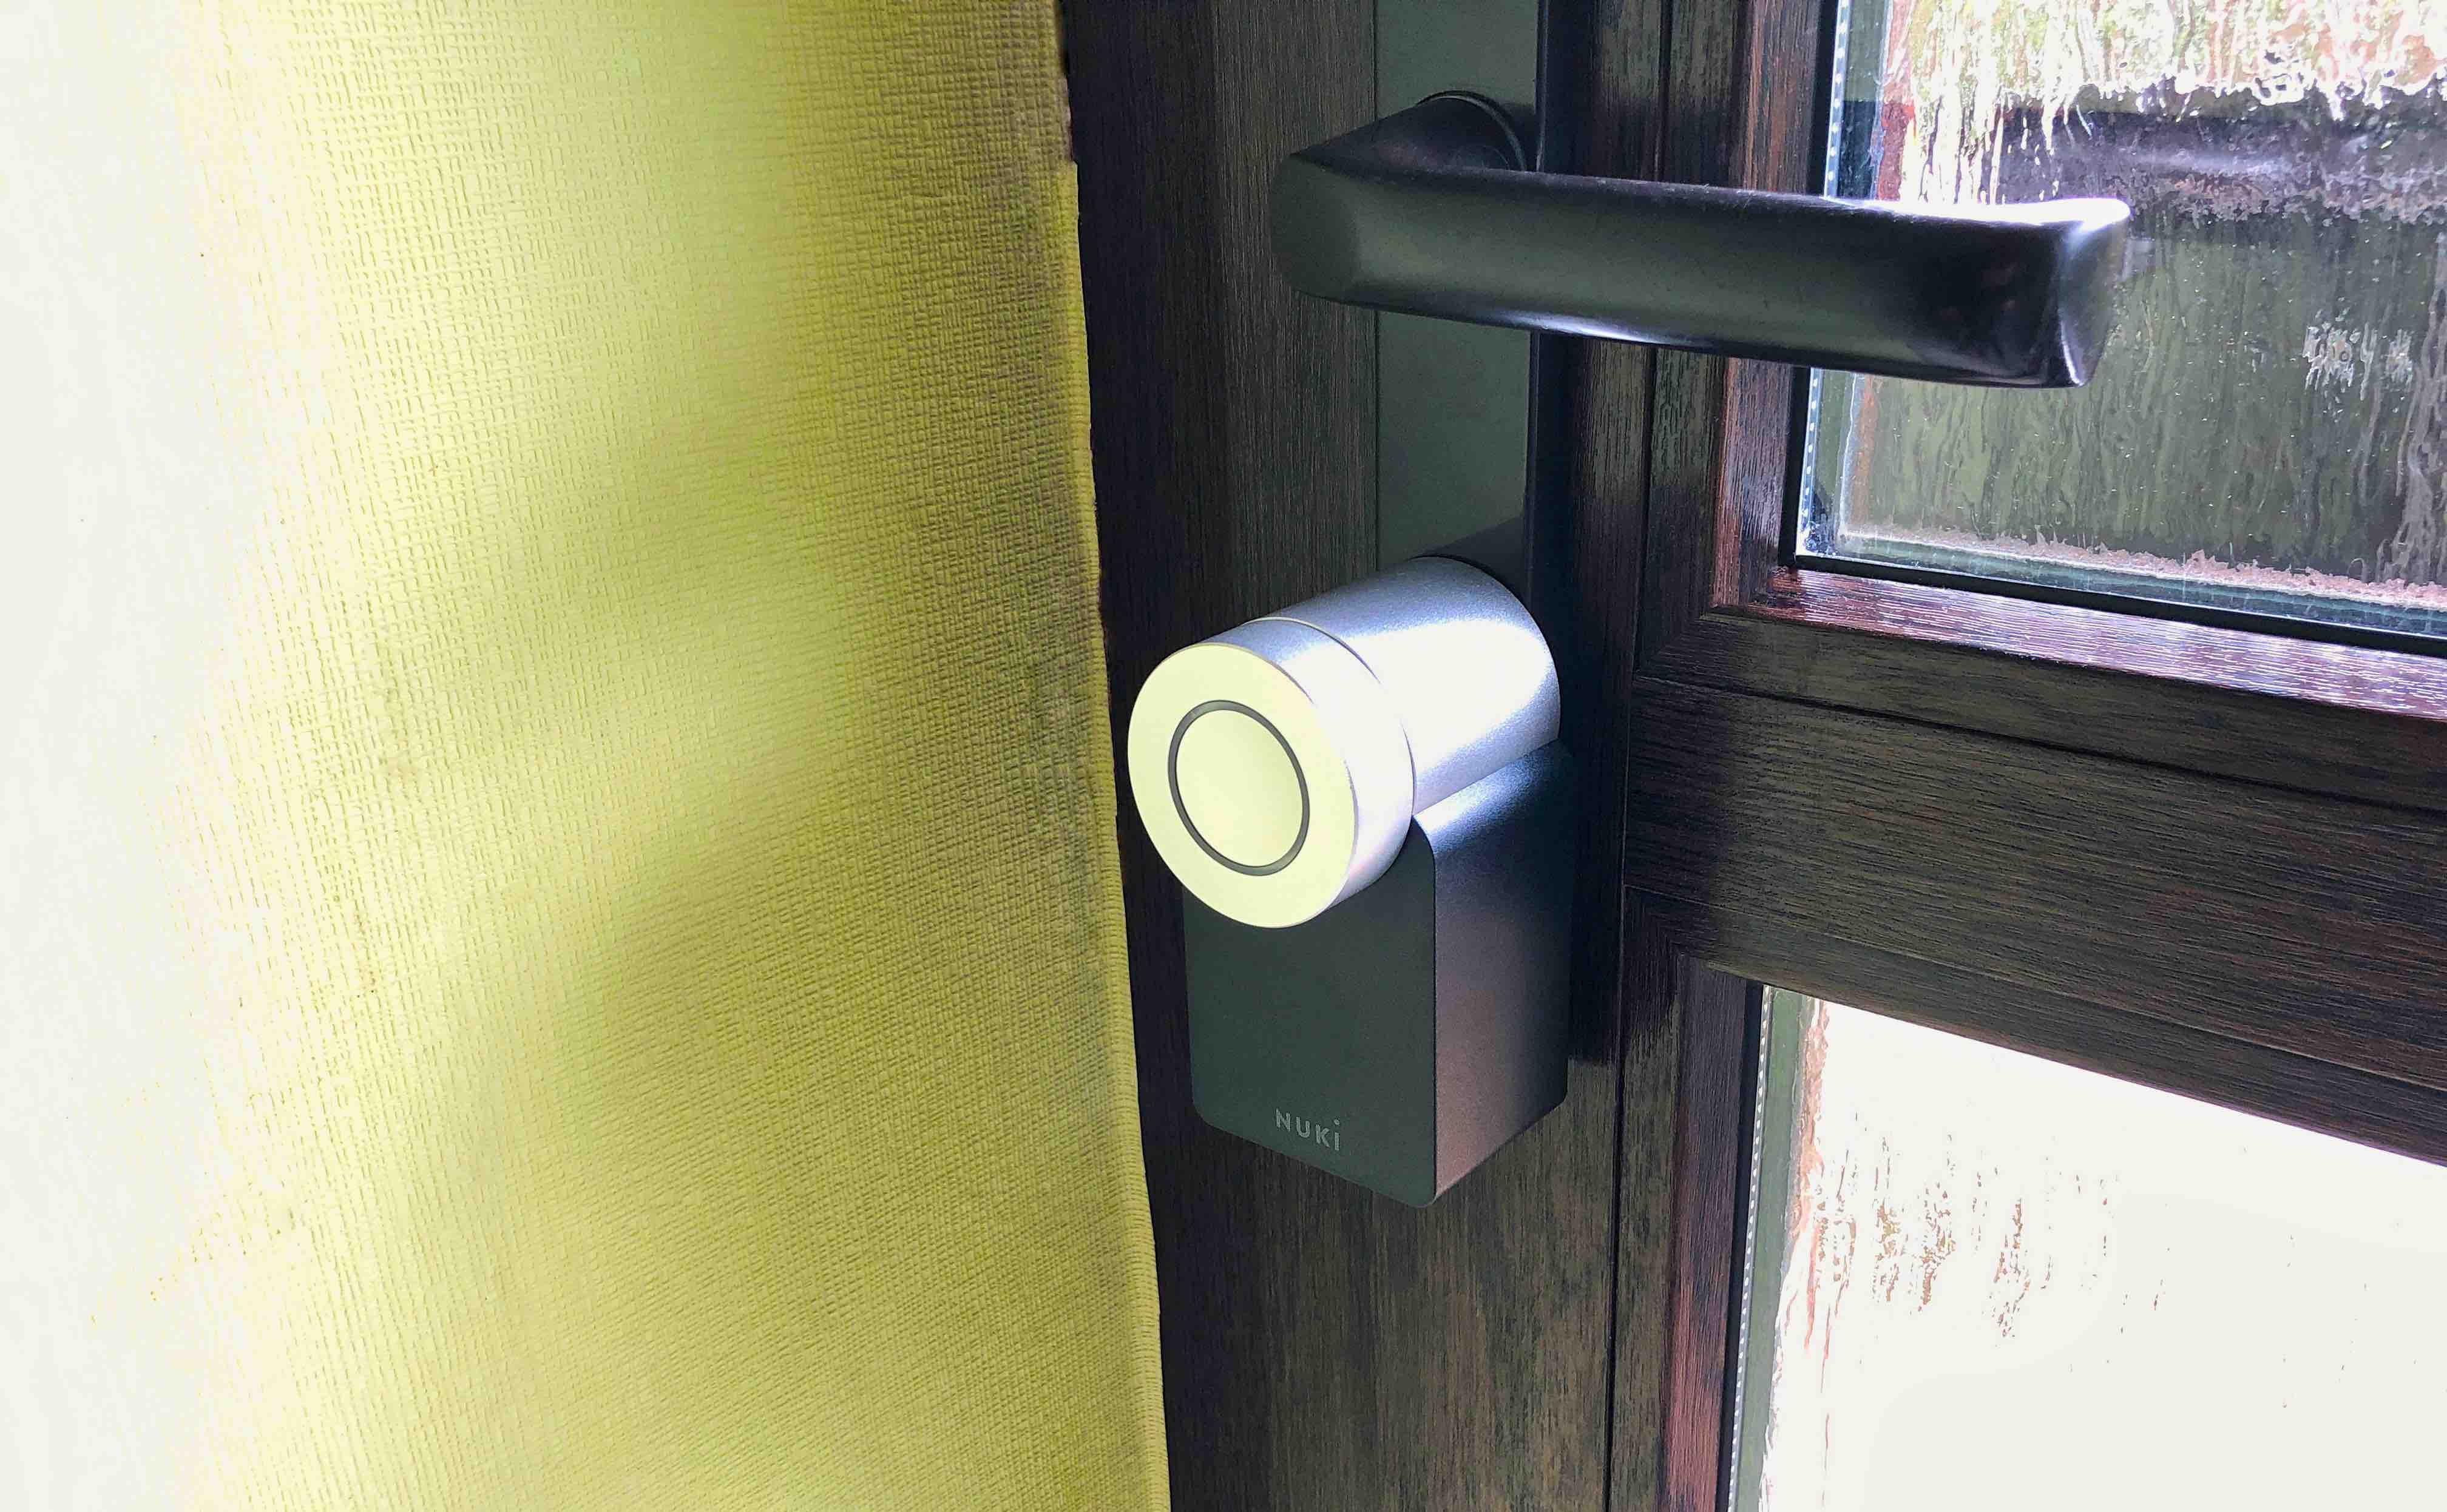 Nuki_HomeKit_Türschloss_SmartHome_Review7 Nuki 2.0 mit Apple HomeKit - das smarte Türschloss